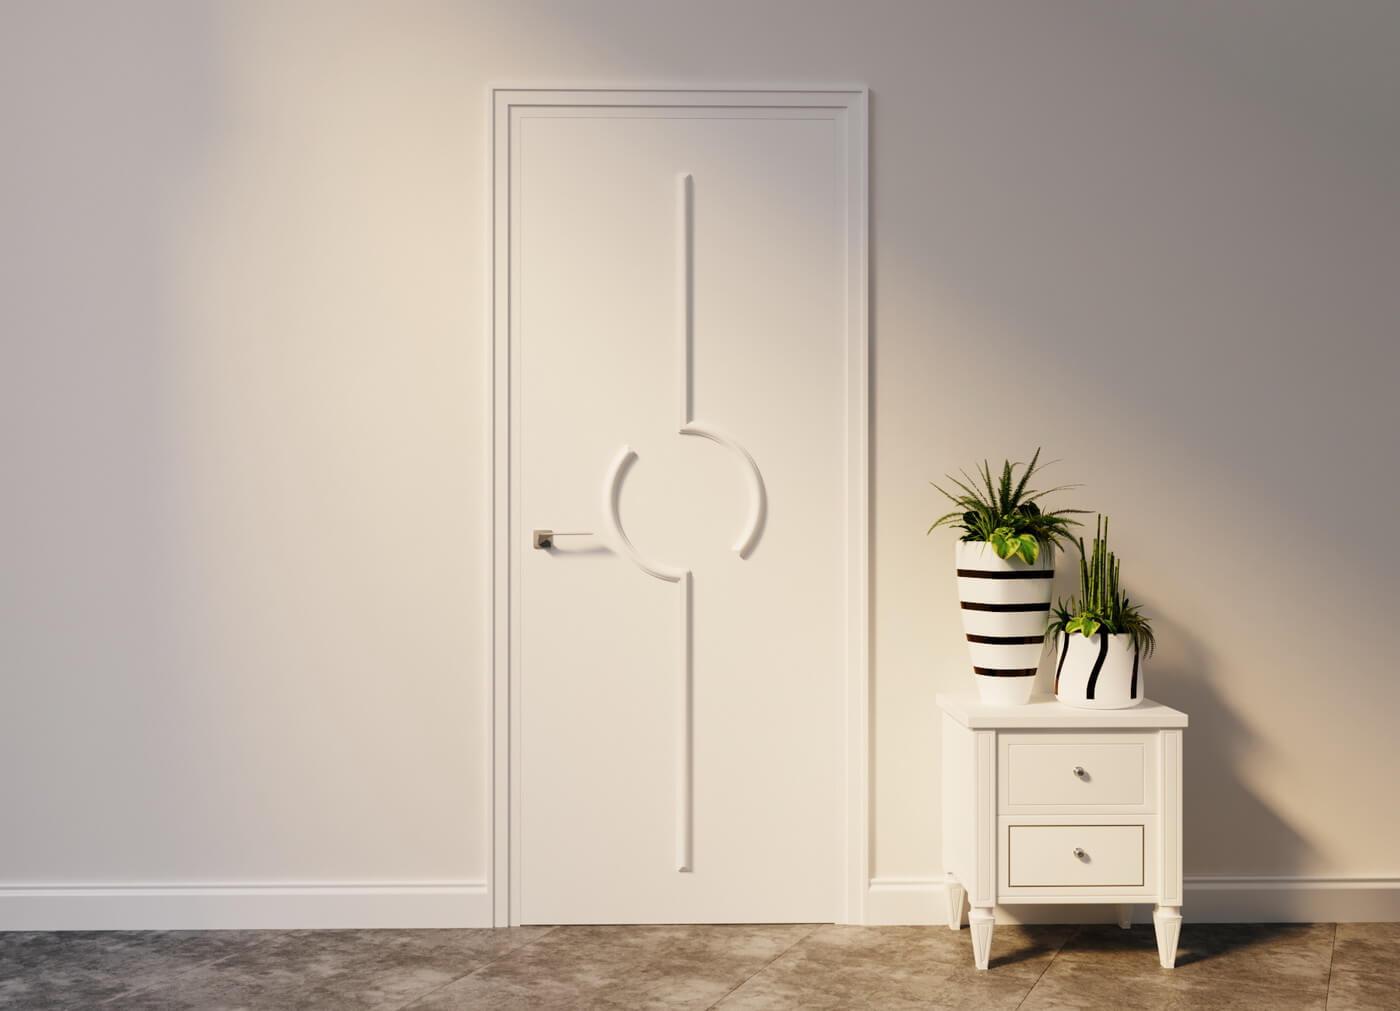 Предметный дизайн_Дверь NewClass 4_1